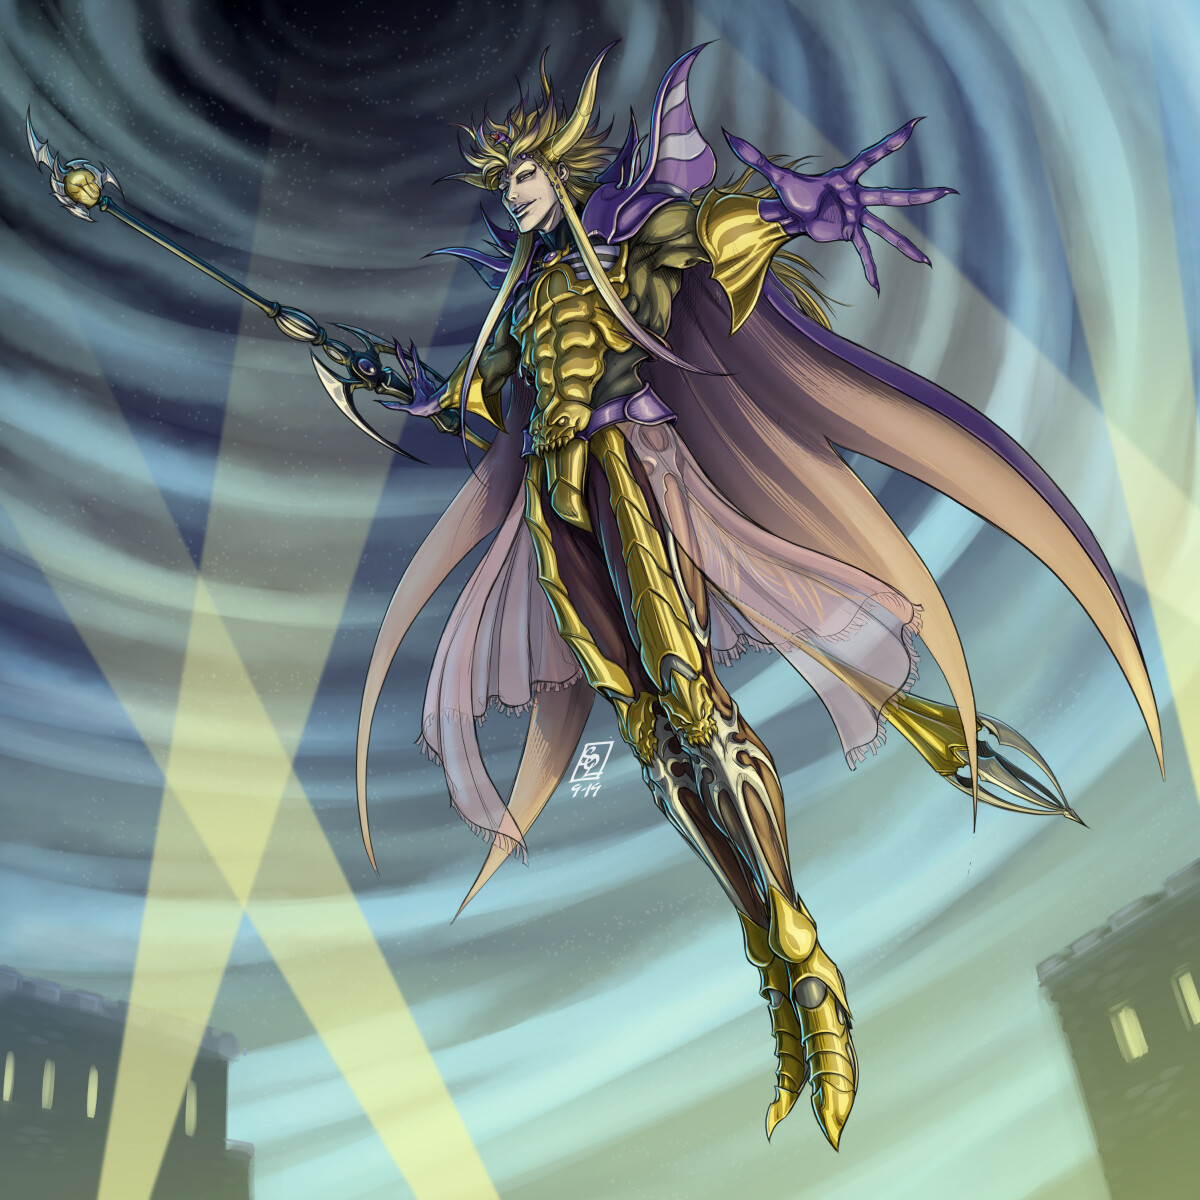 Palamecian Emperor Mateus (Final Fantasy II)